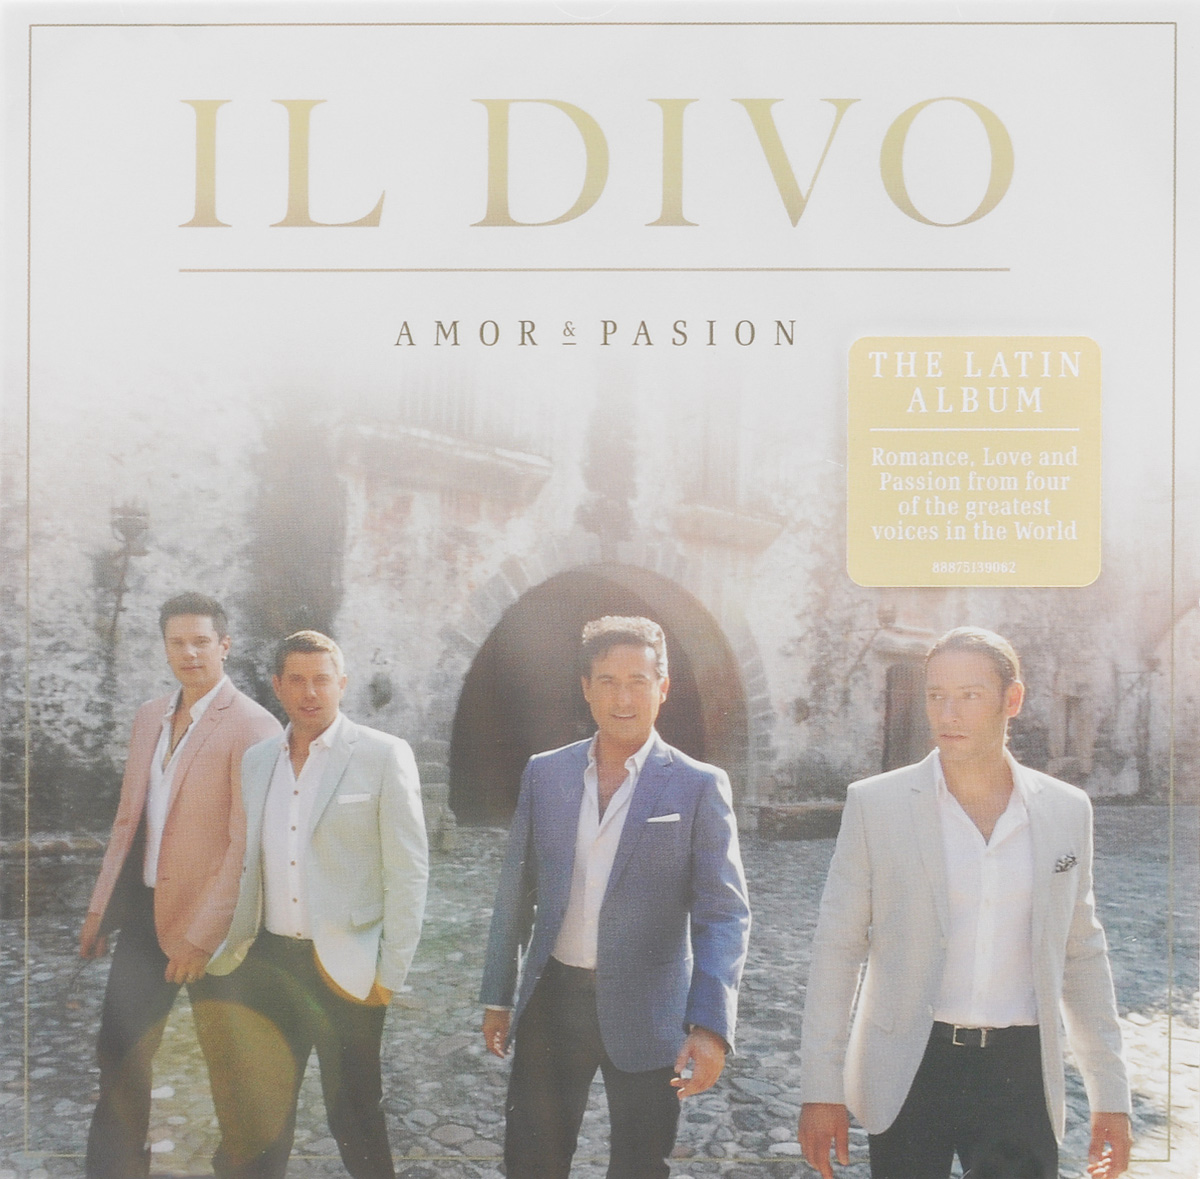 Il Divo Il Divo. Amor & Pasion storm 47314 rg